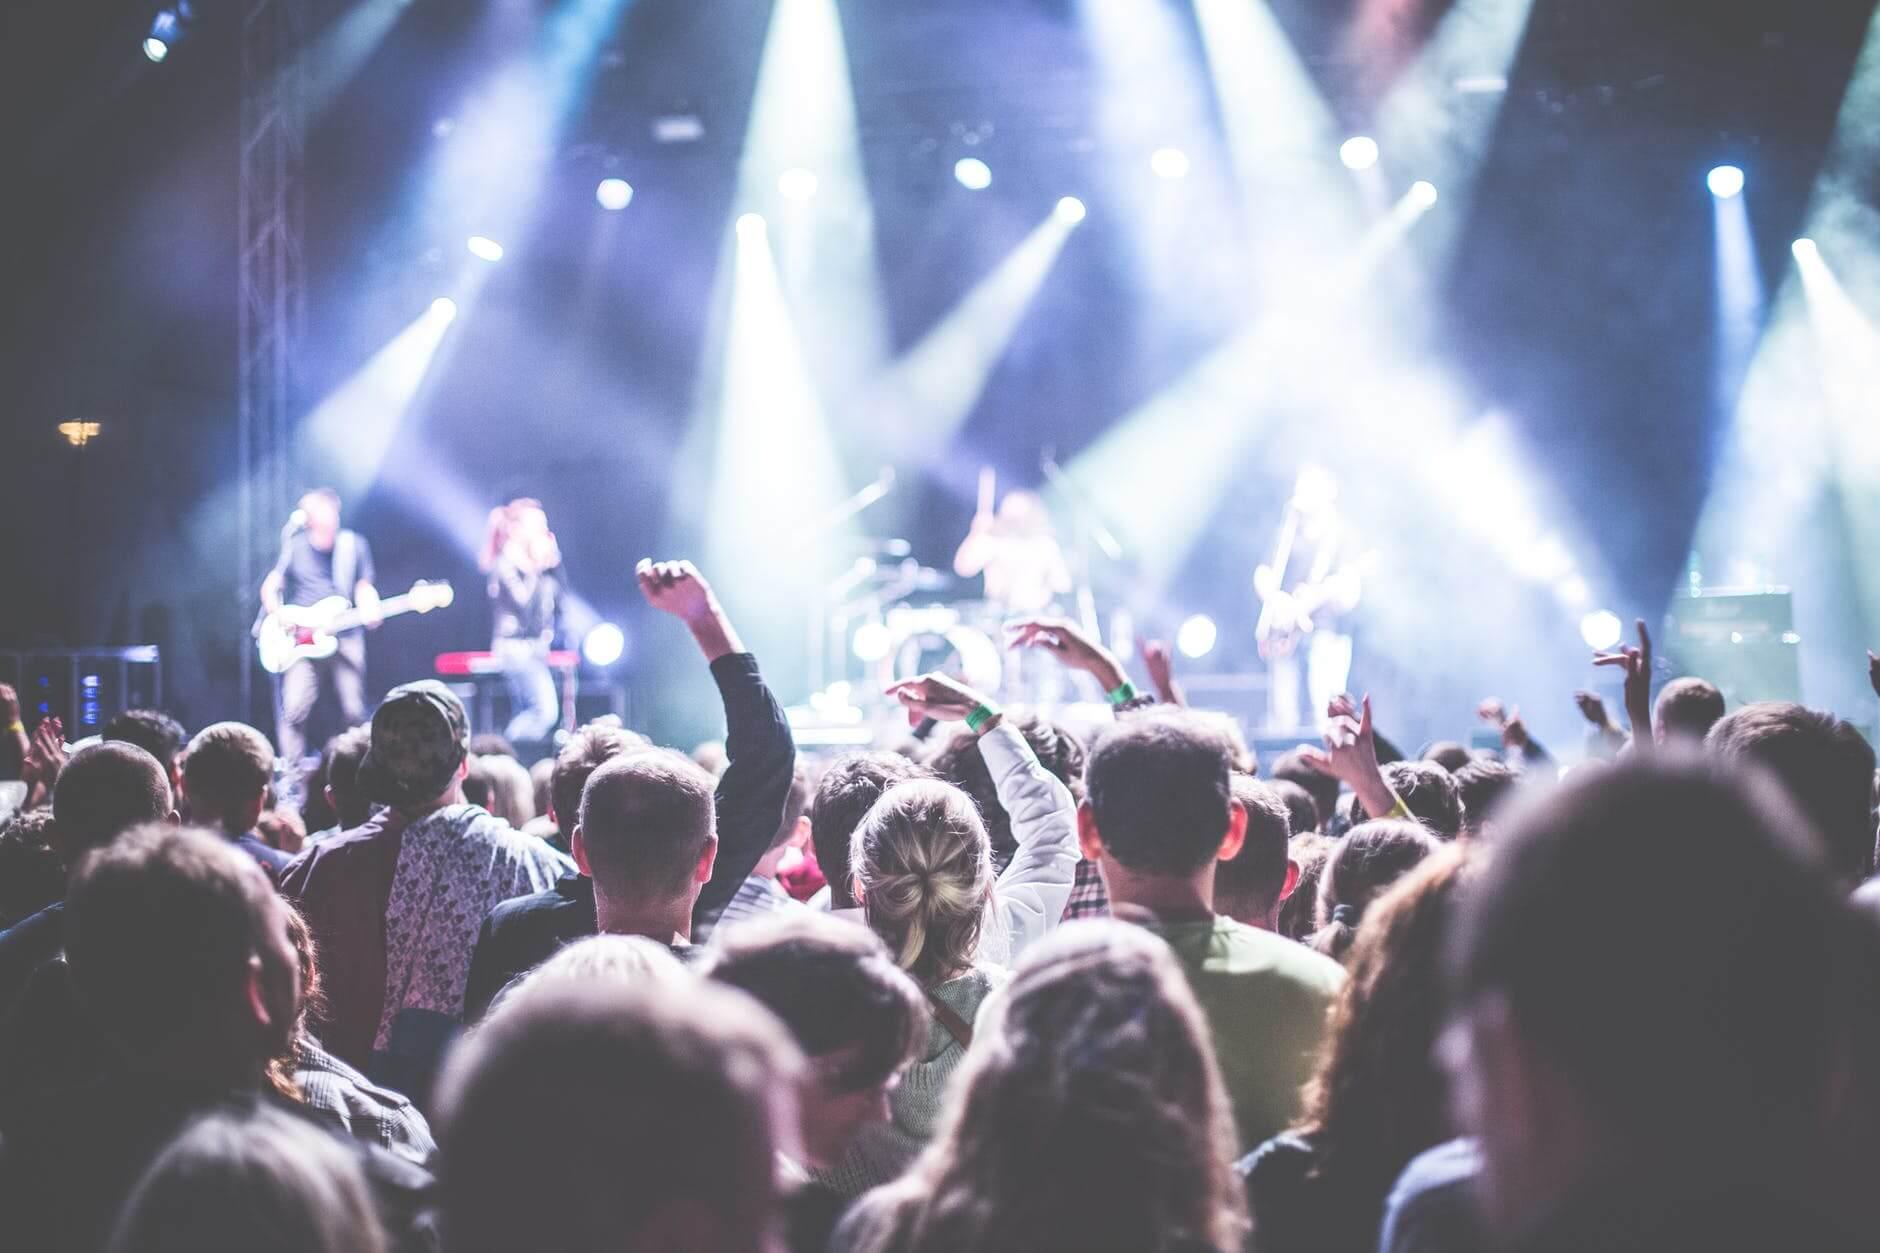 Ilustrasi konser musik. (Foto: Pexels/Tugu Jatim)